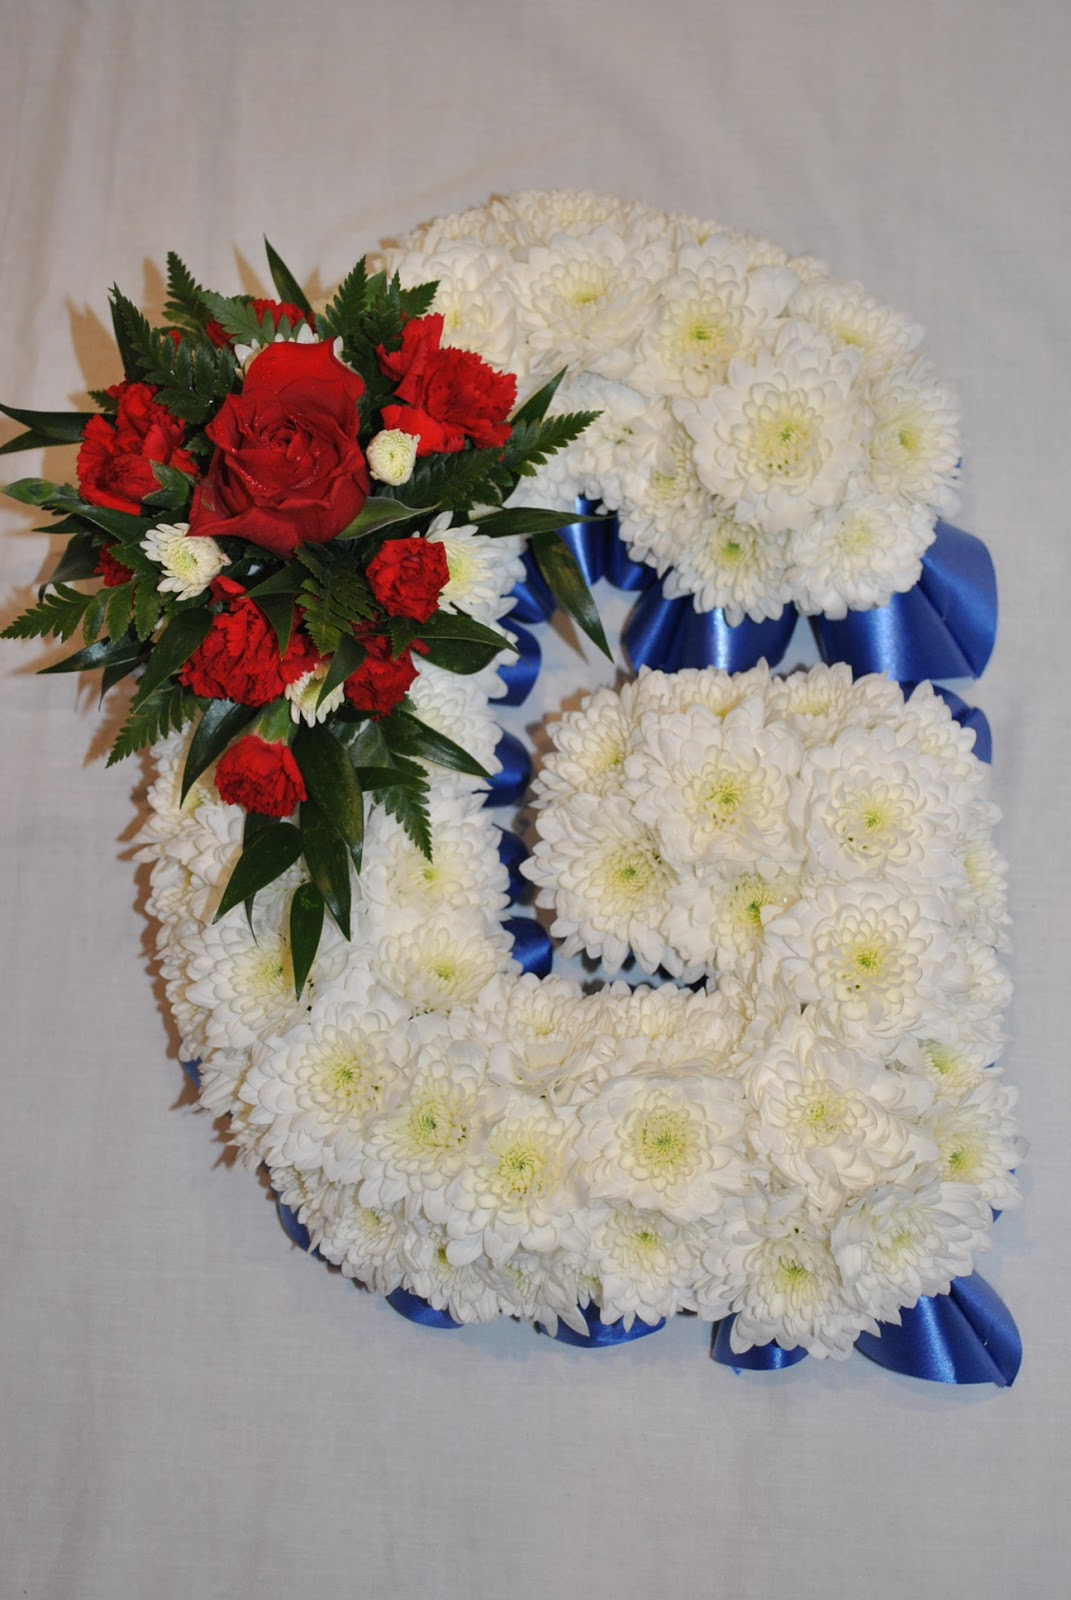 Lucys flower studio letter g for graham pressler grahams funeral flowers in the colours of his favourite football team blackburn rovers izmirmasajfo